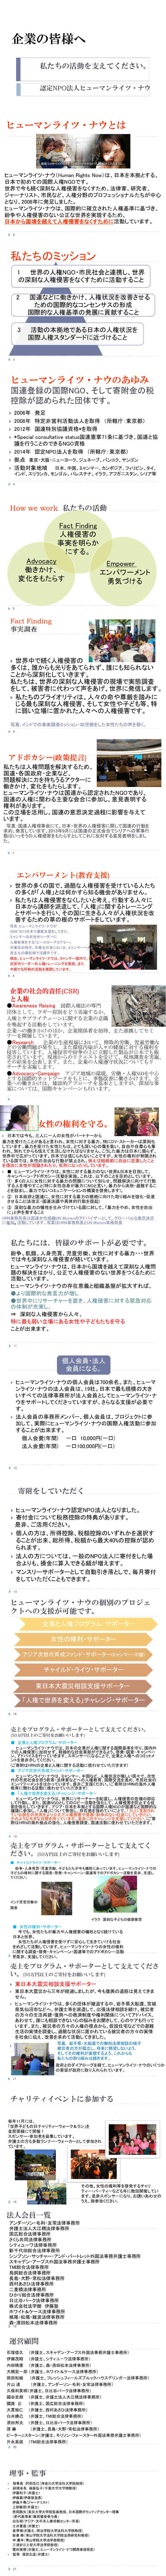 to_company